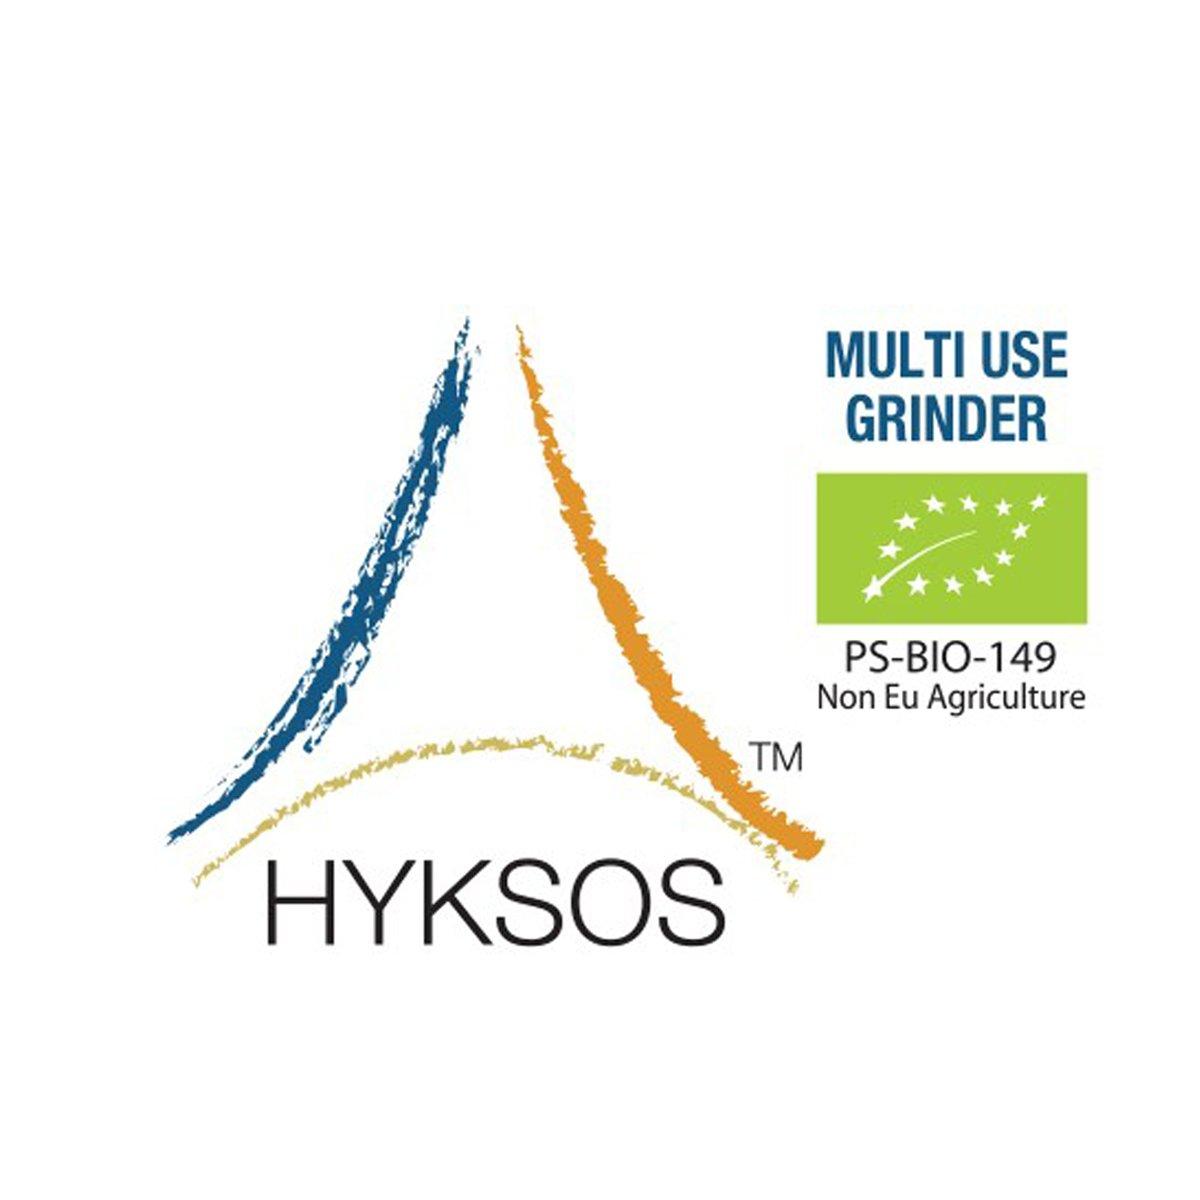 Hyksos Natural Edible Coarse Salt 3.9 oz - Multi Use Grinder by HYKSOS (Image #4)